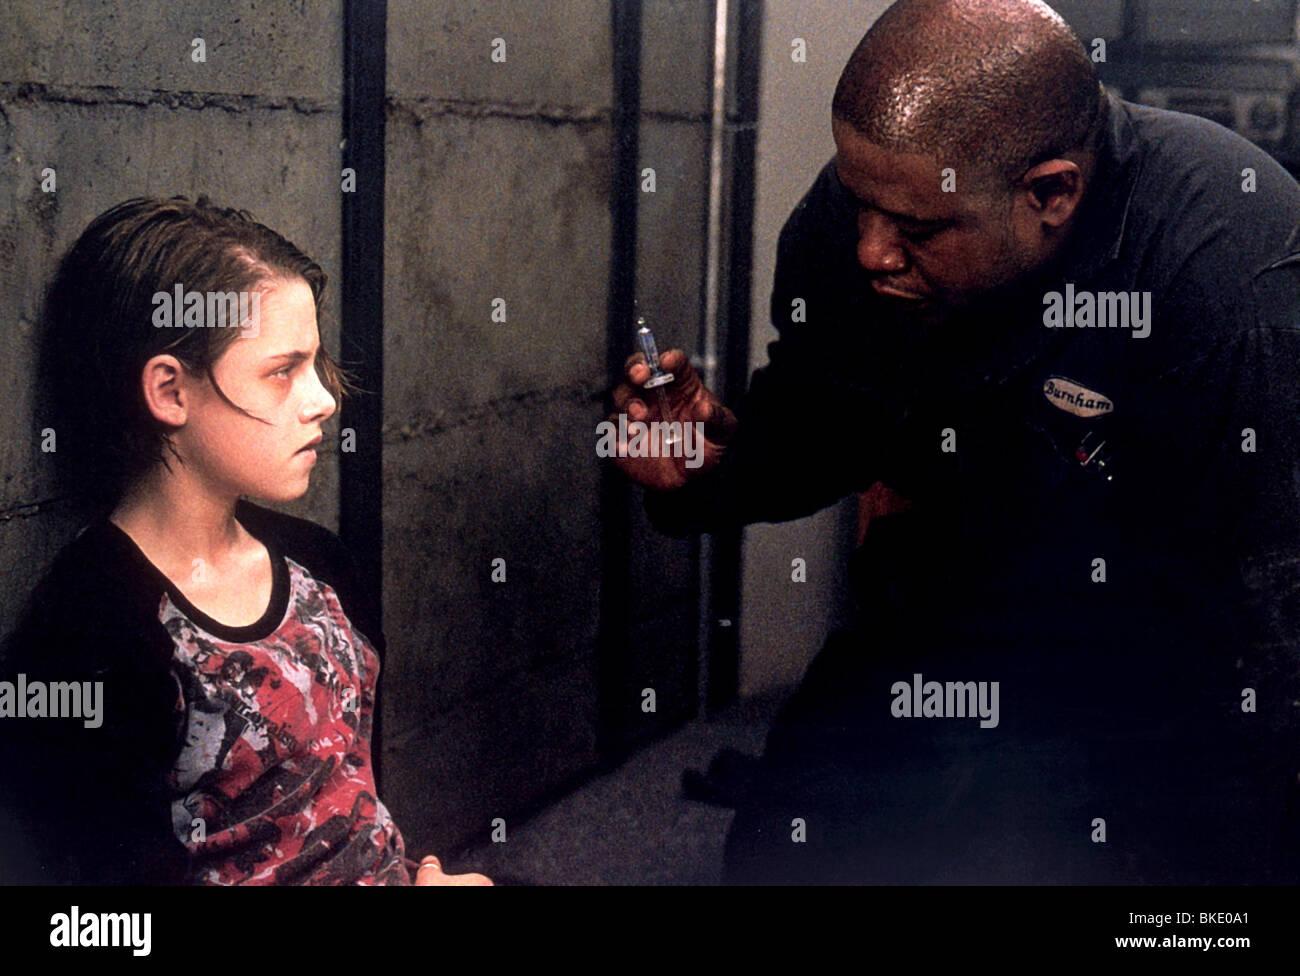 Panic Room 2002 Kristen Stewart Forest Whitaker Paro 003foh Stock Photo Alamy